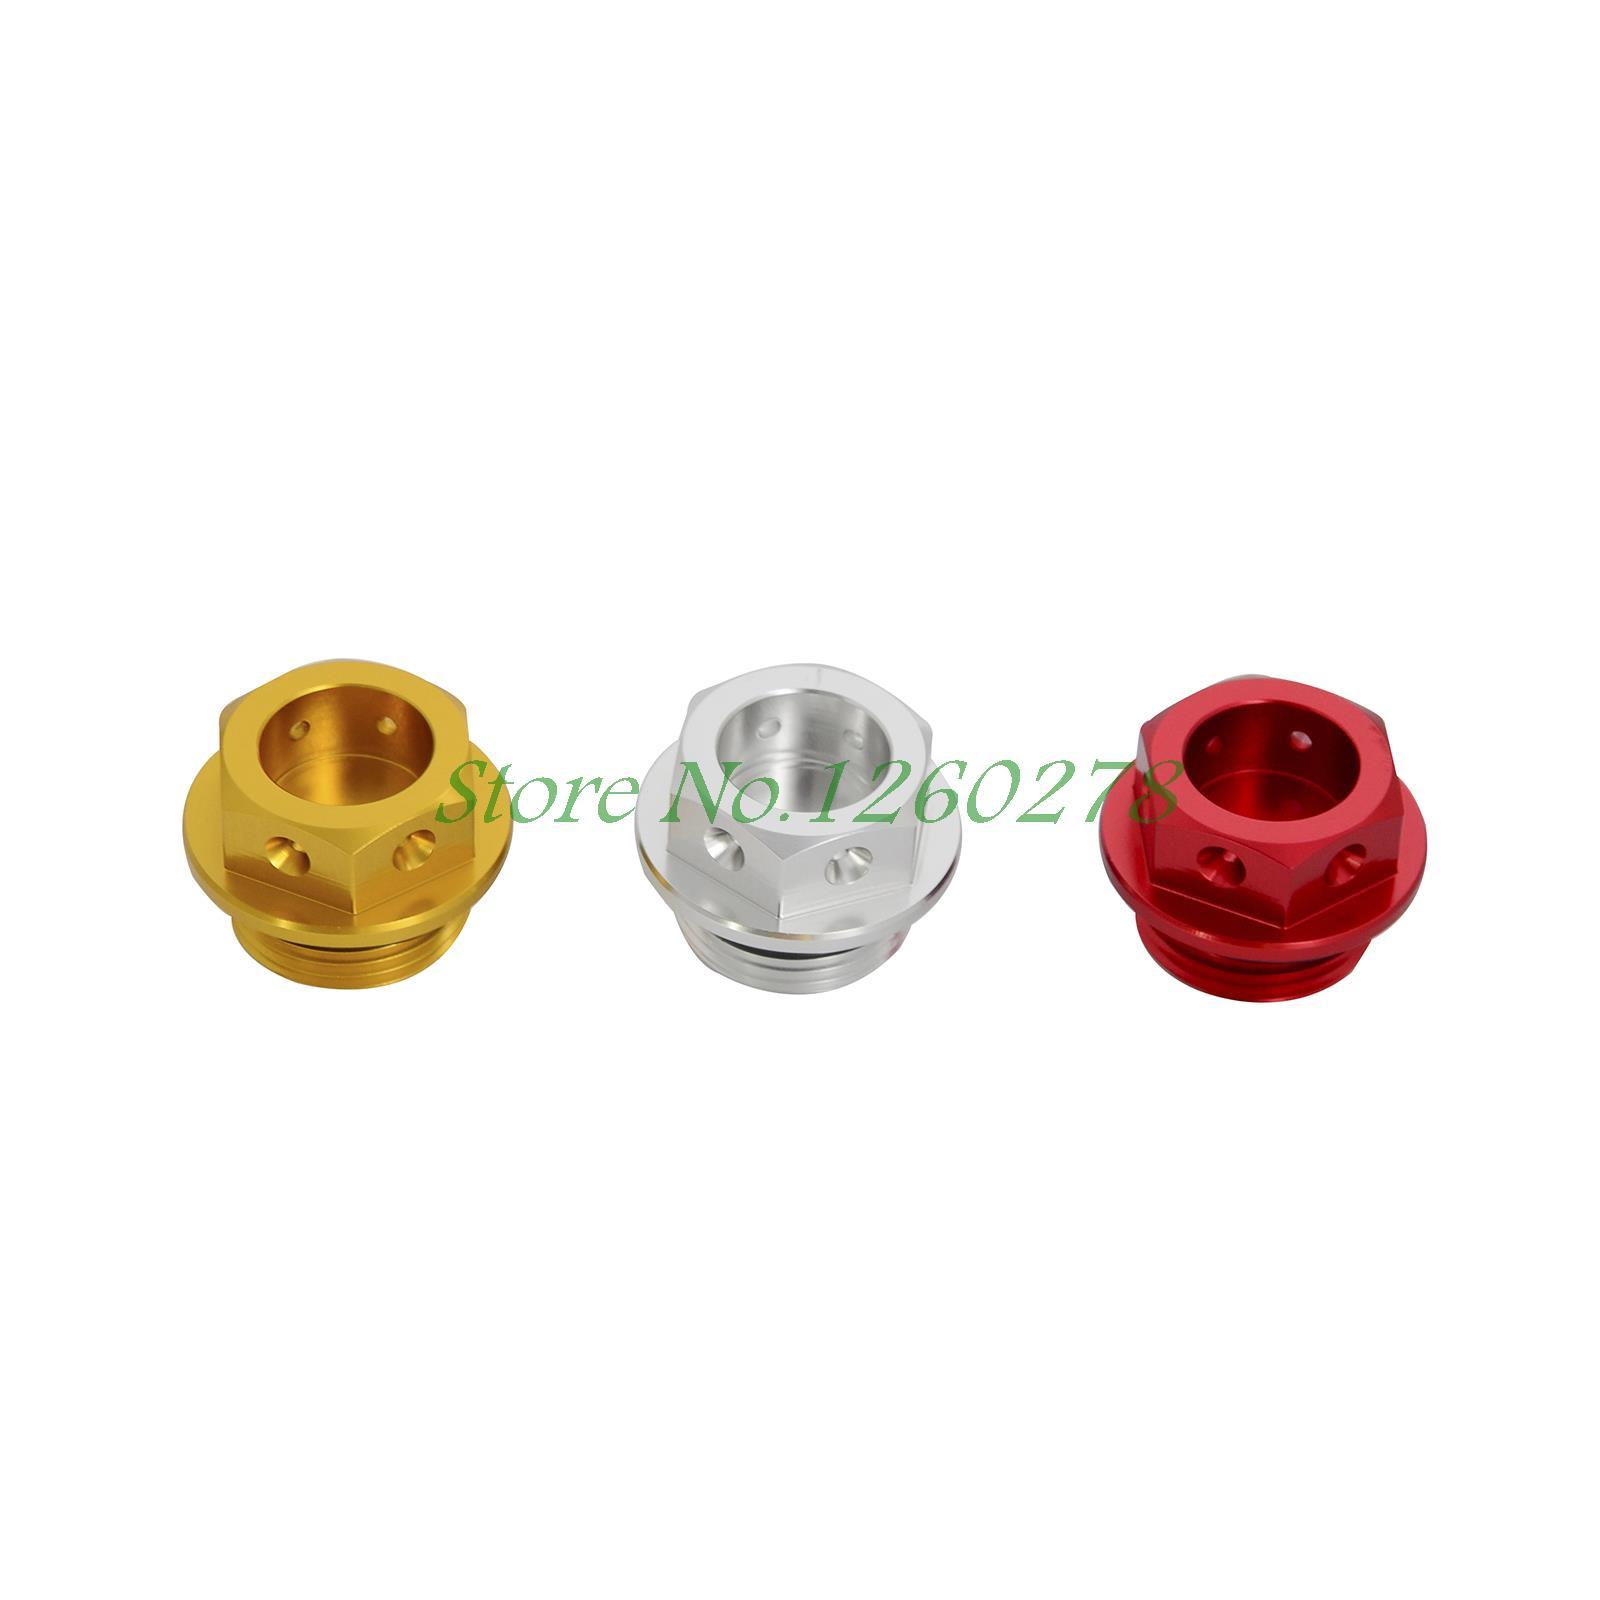 Cnc Aluminum Magnetic Engine Oil Drain Bolt Plug For Ducati 999 St2 Fuse Box Location Ss 1000 600 750 98 800 900 91 97 St3